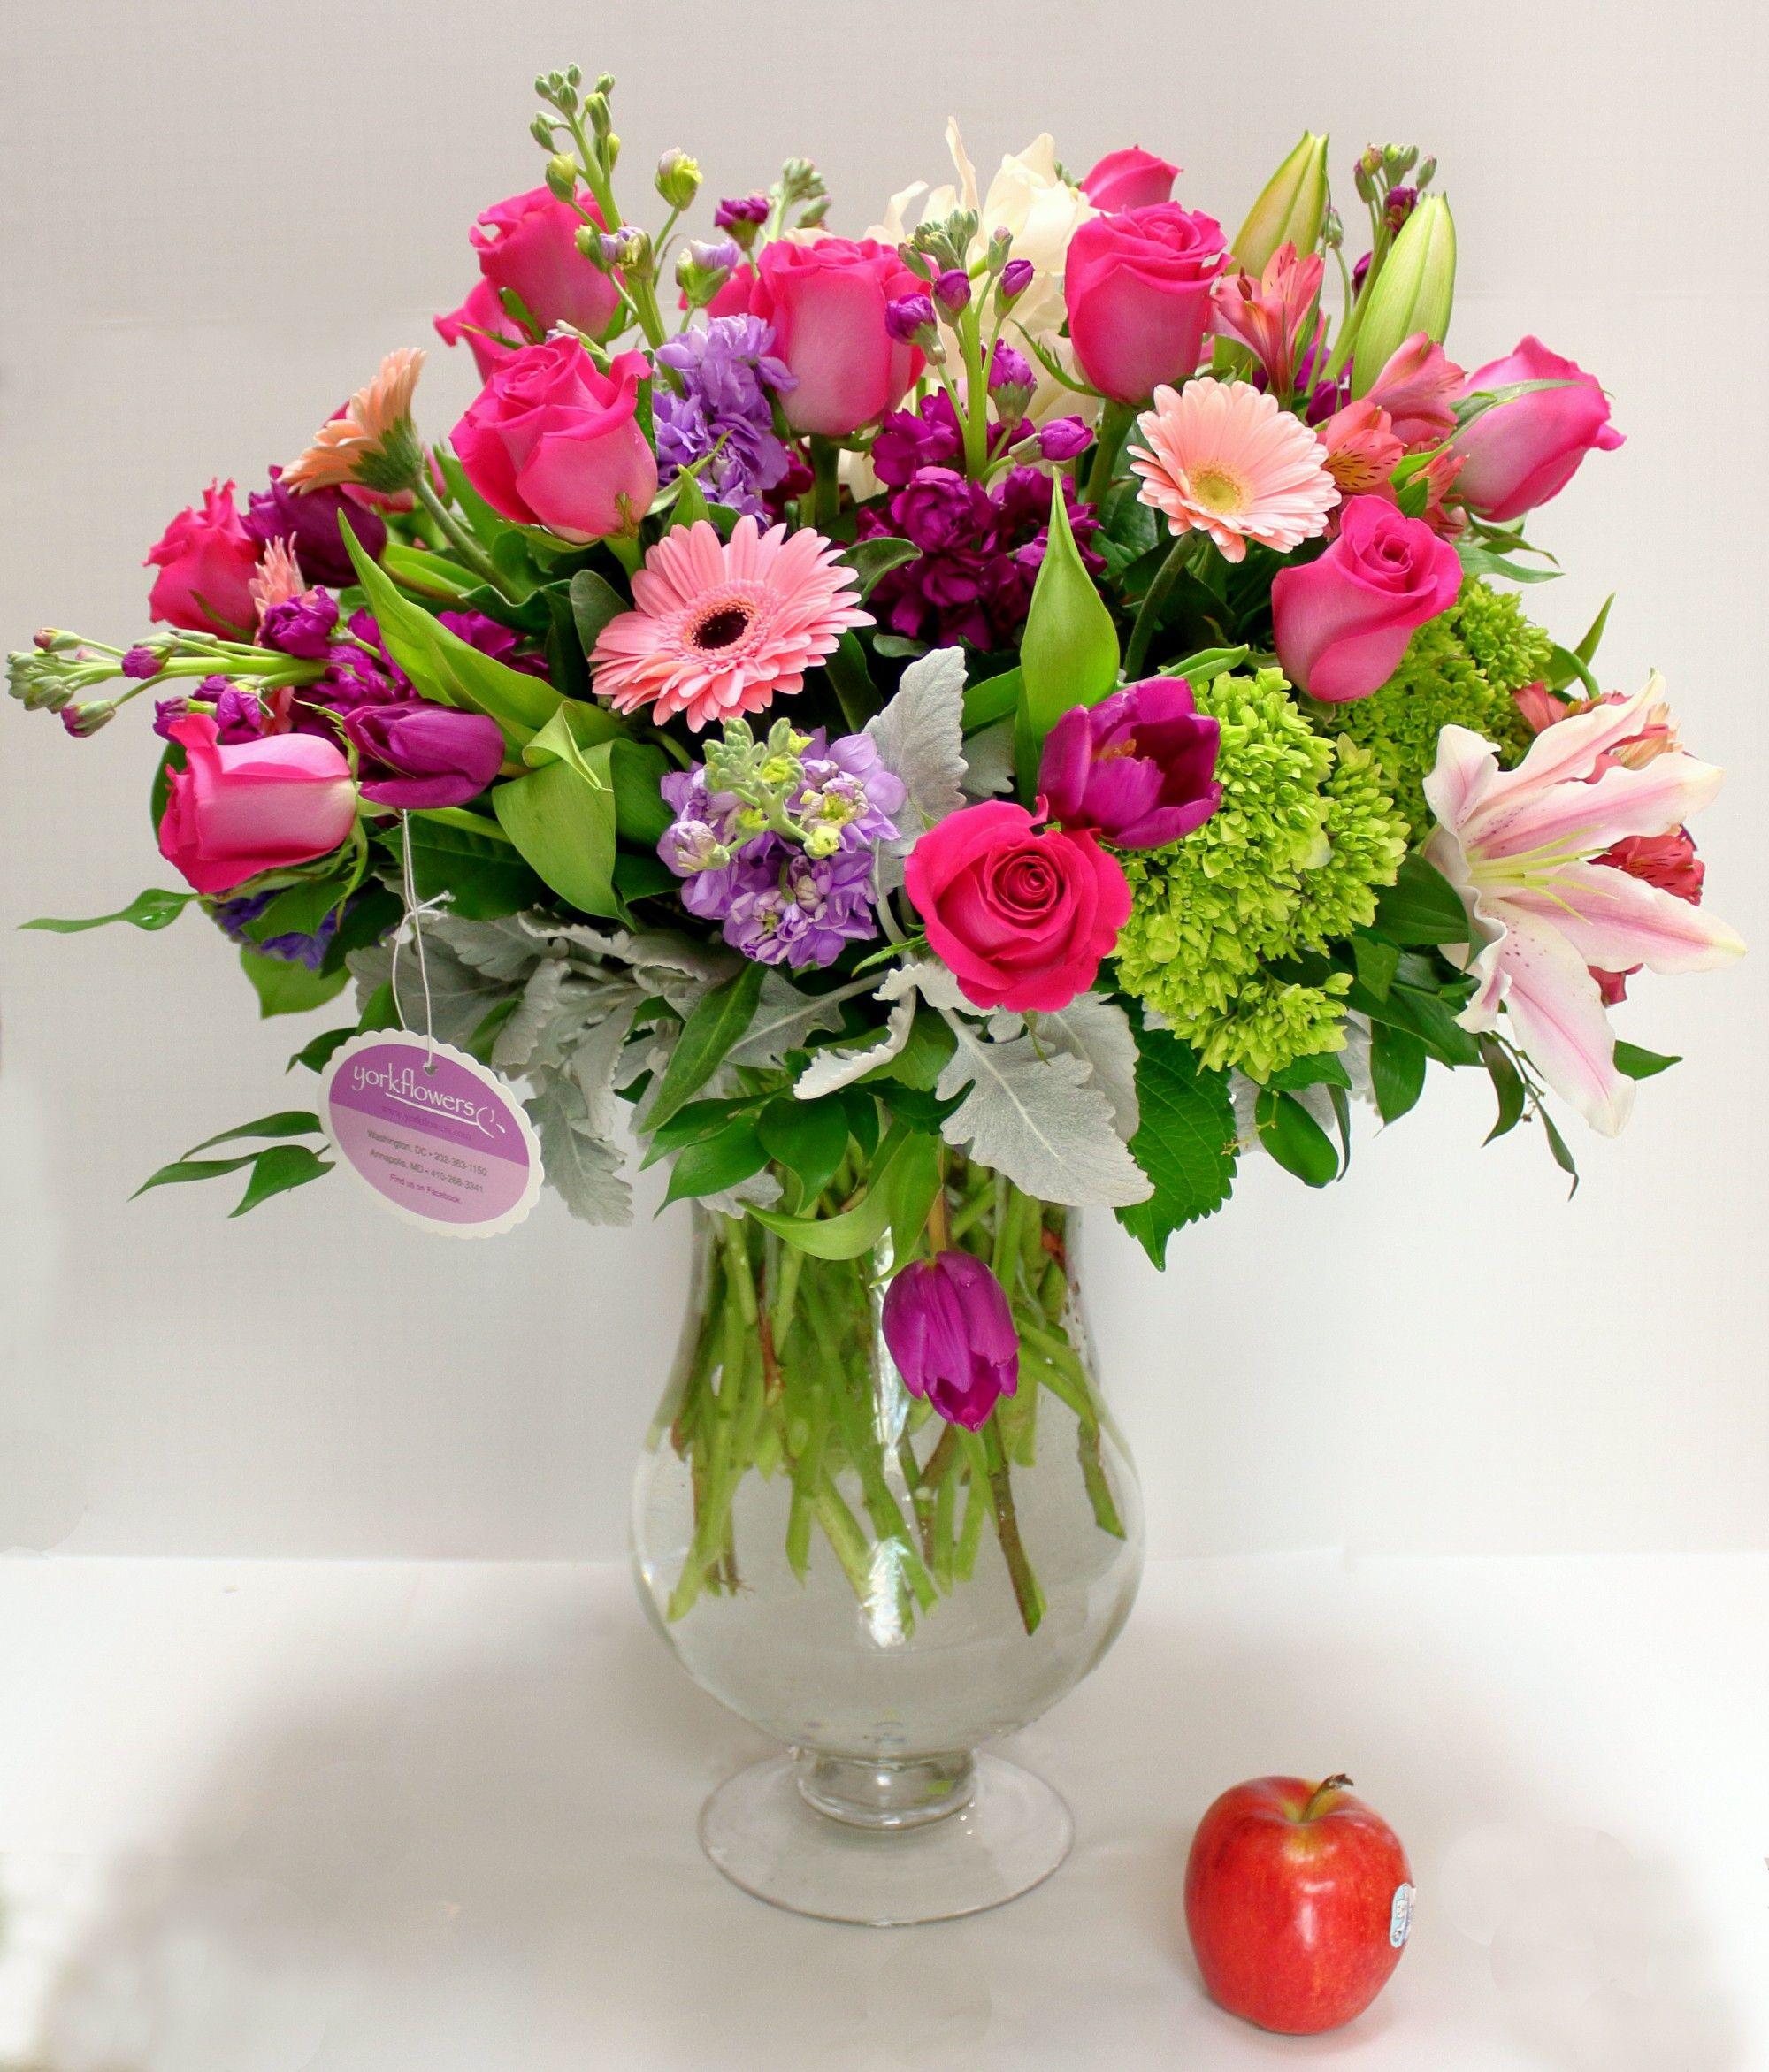 Send Dazzling Bouquet in Washington, DC from York Flowers